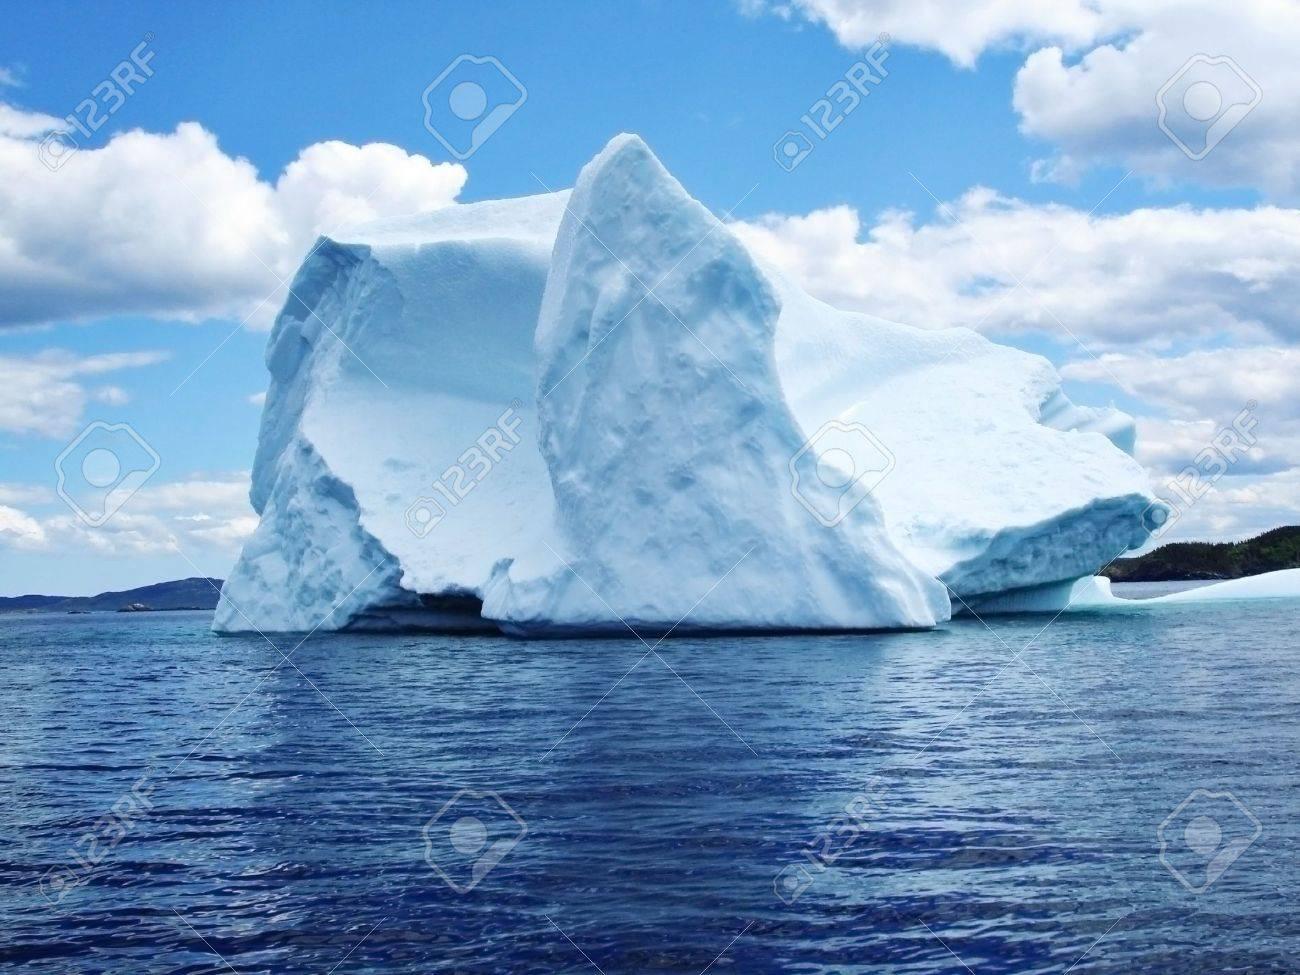 Iceberg in Atlantic Ocean off Newfoundland Stock Photo - 6354382